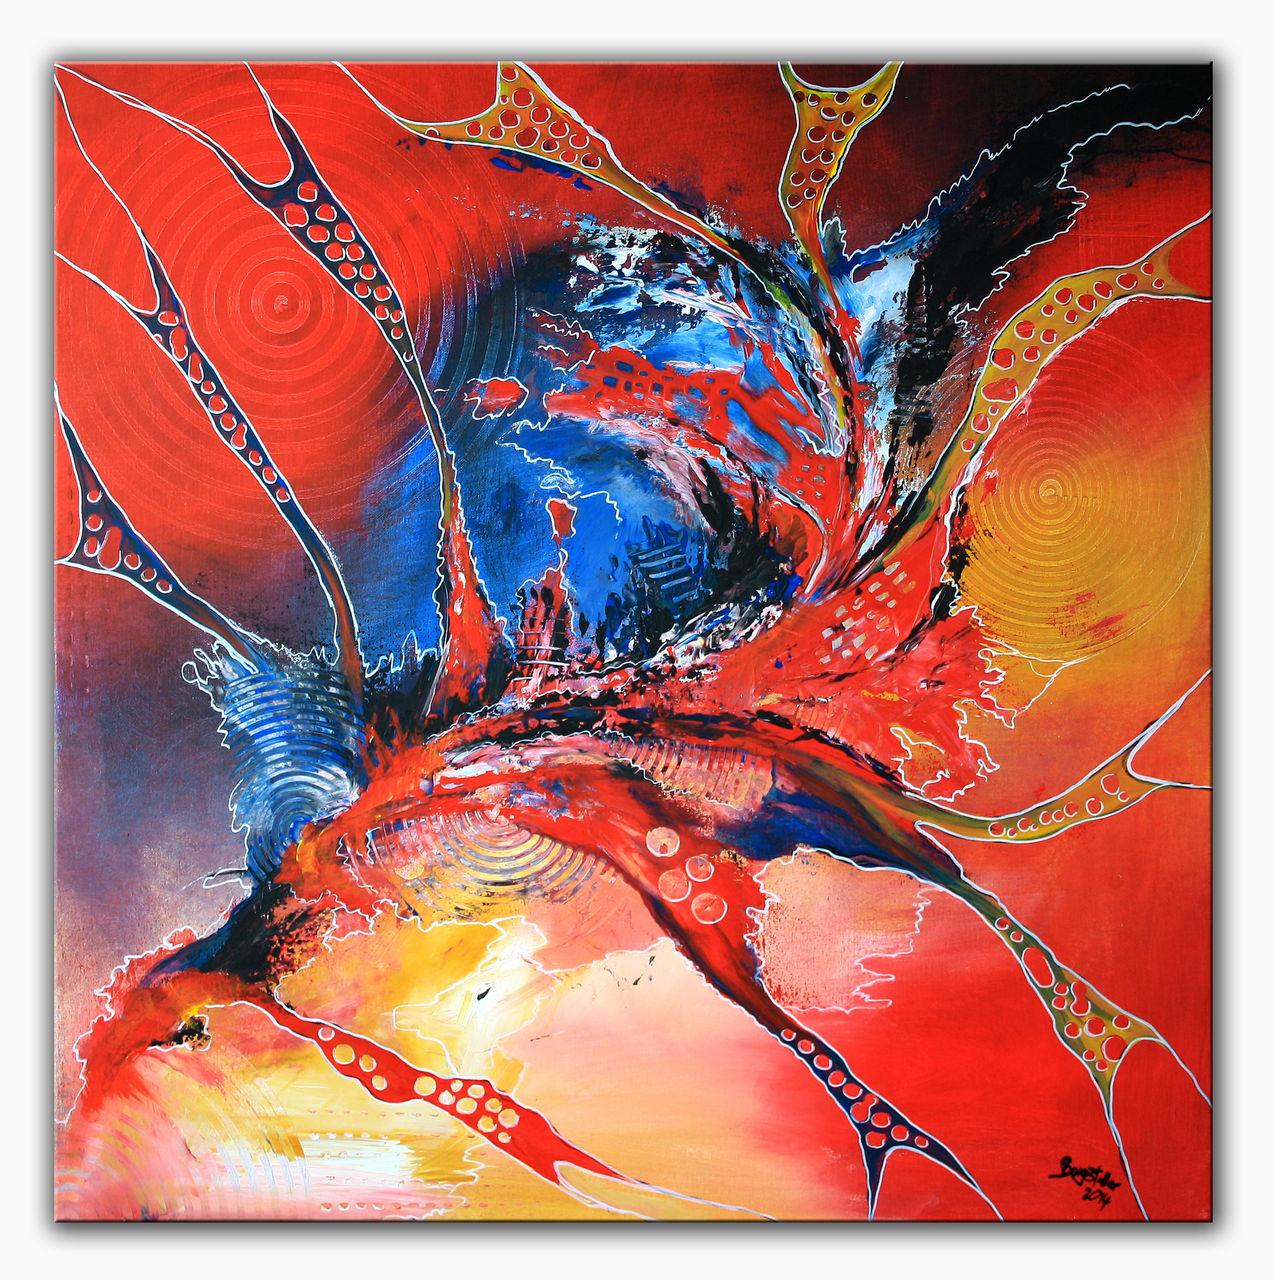 Gemälde Kunst bild modern gemälde künstler abstrakte kunst alex b bei kunstnet